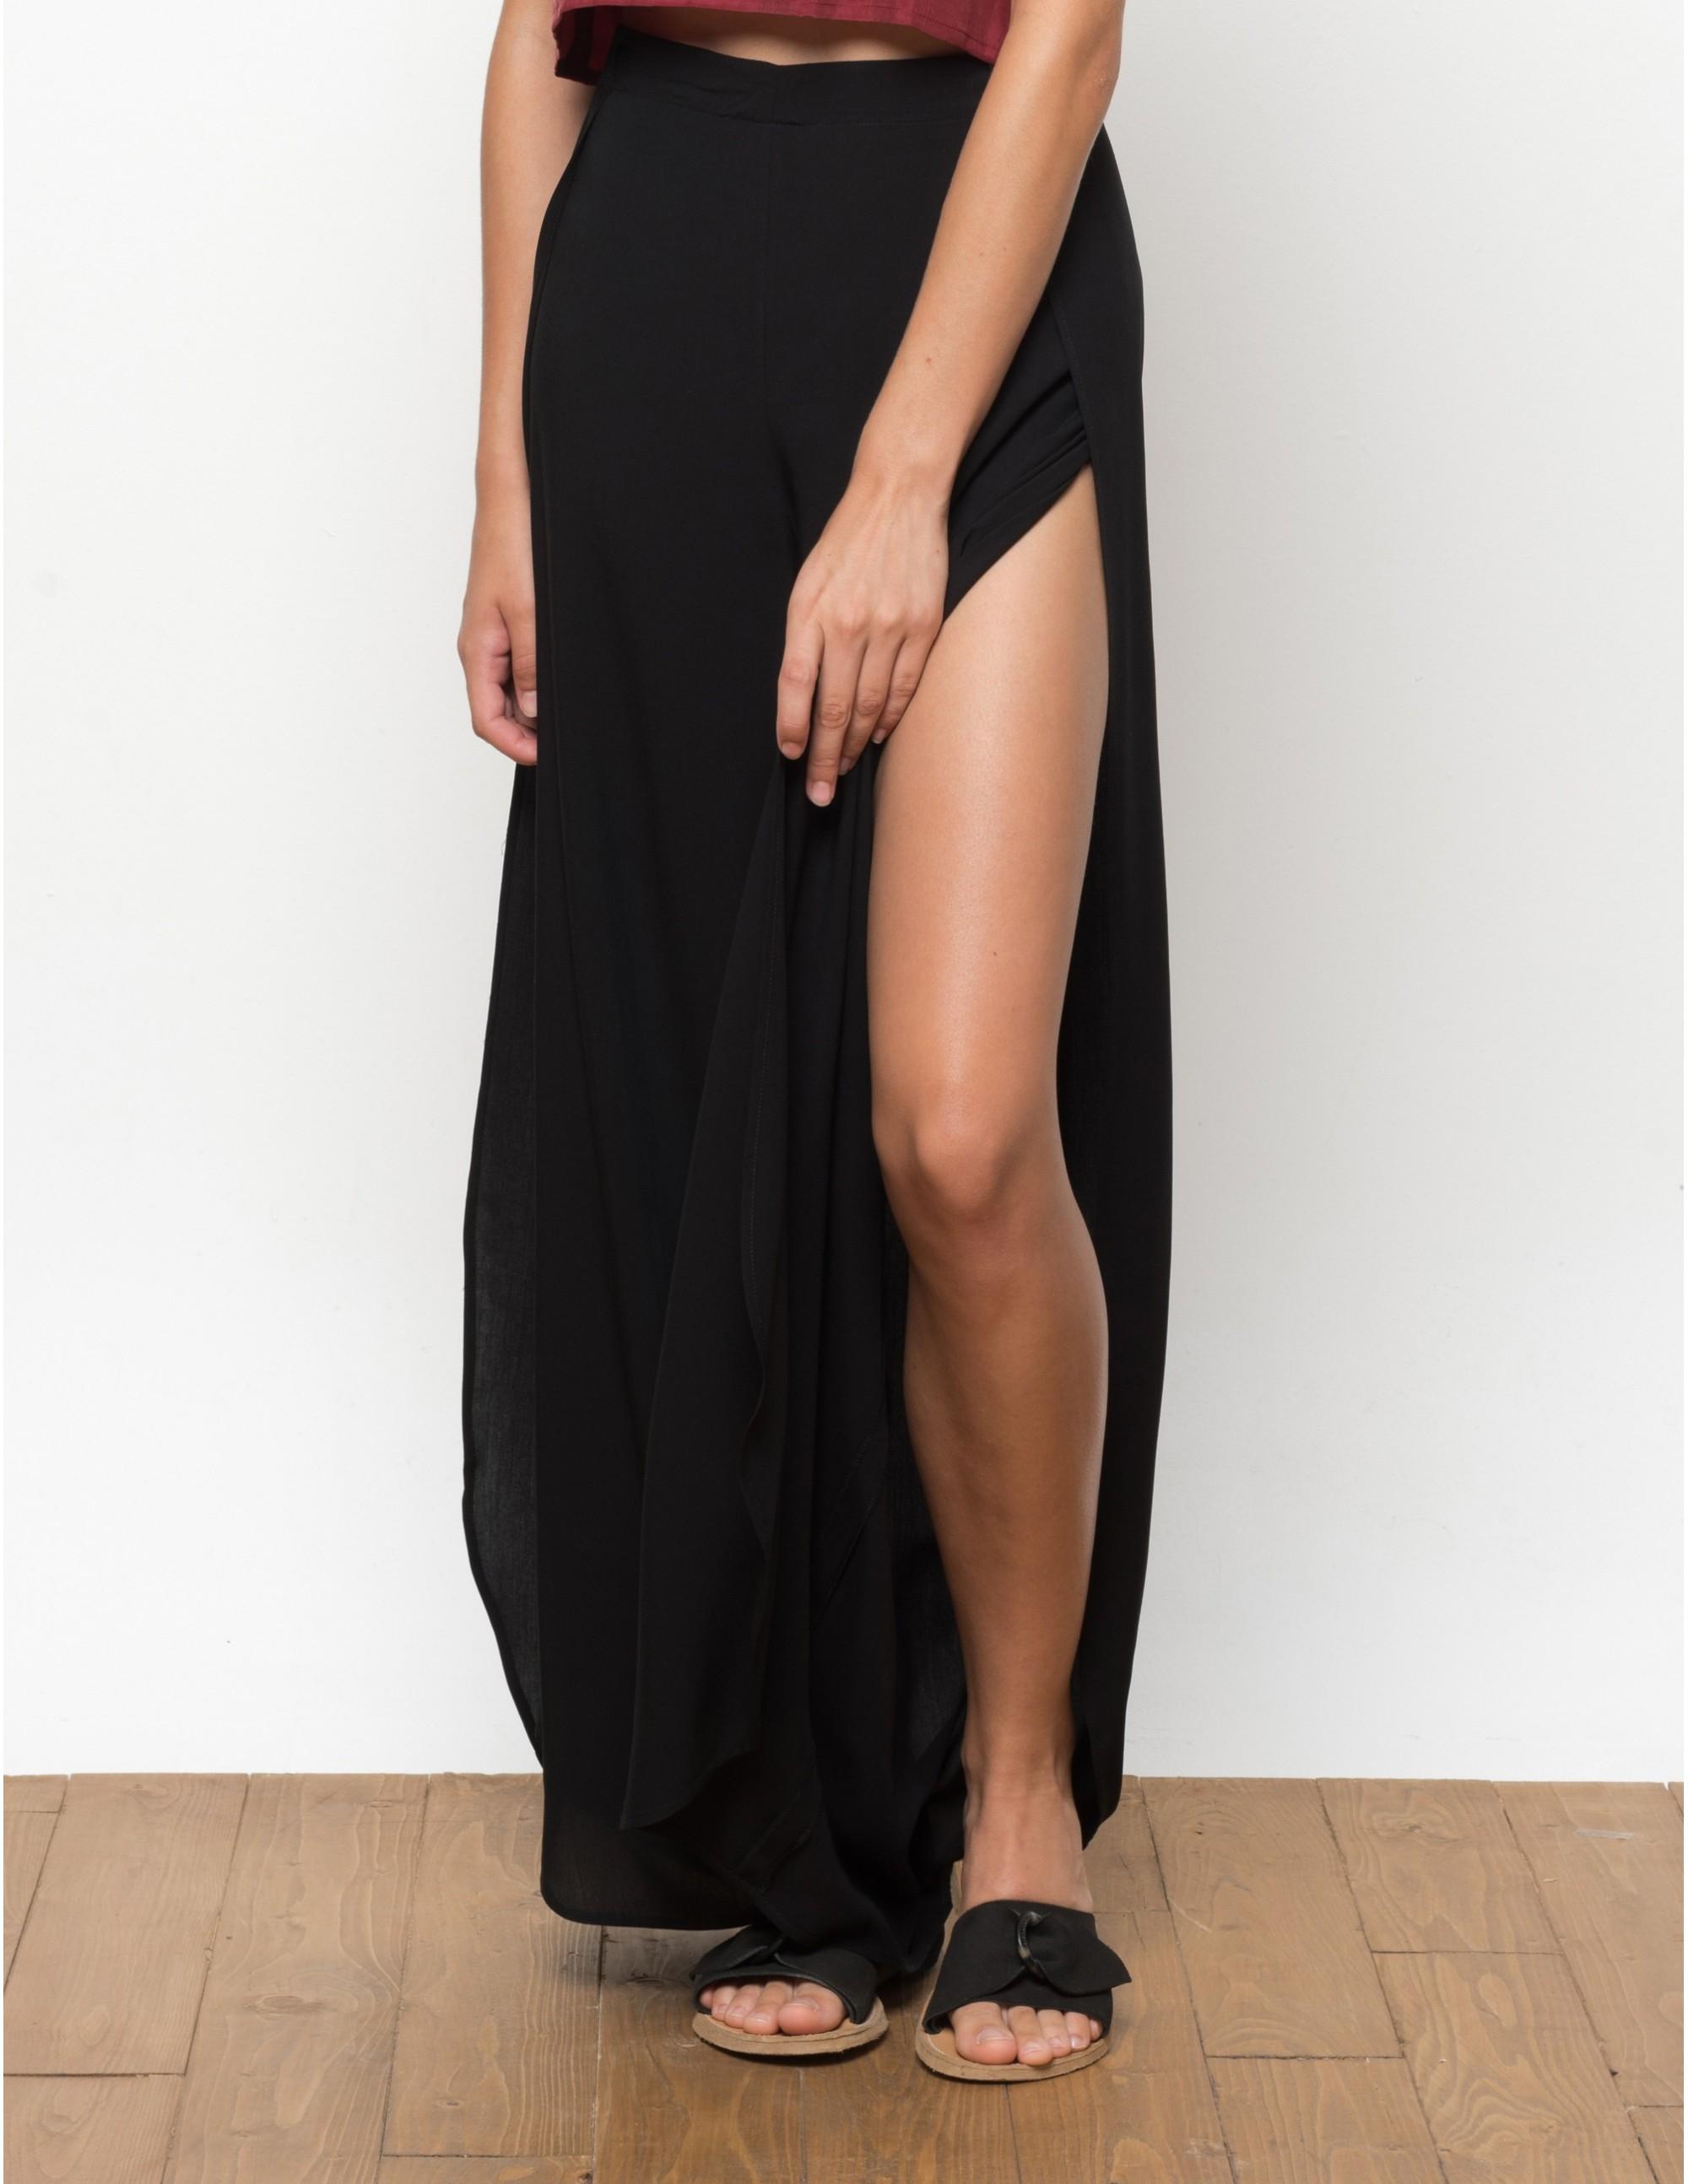 MISALI trousers - BLACK